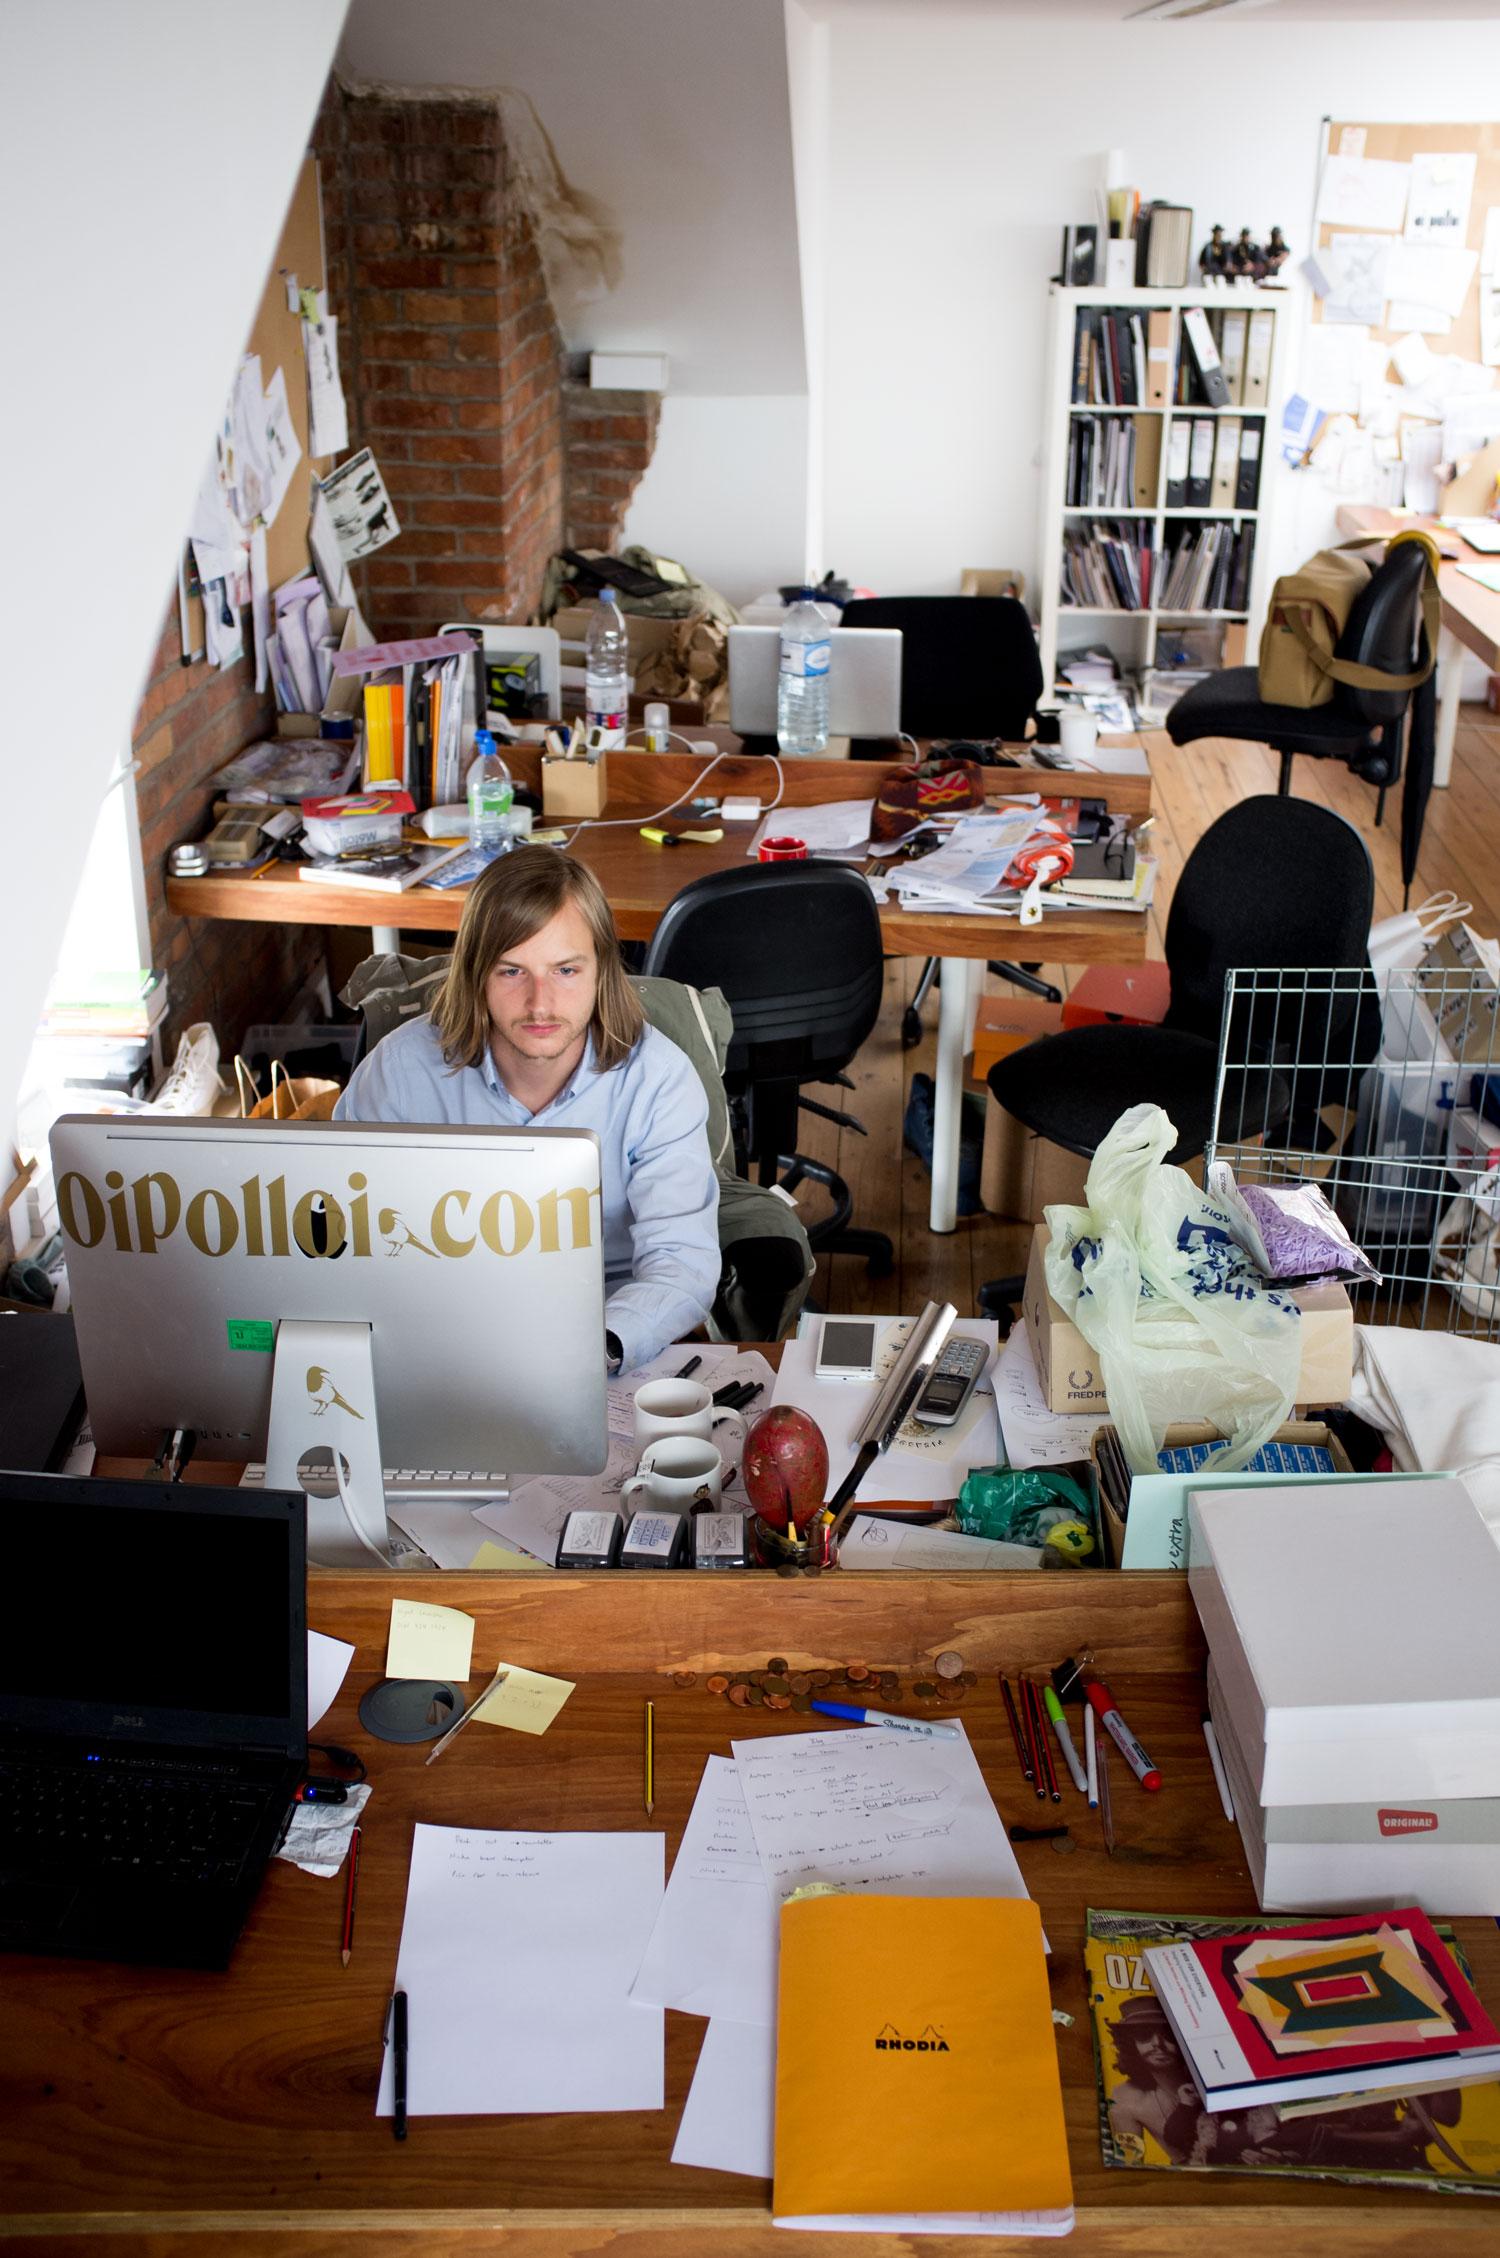 2014-05-30 Messy-office.jpg